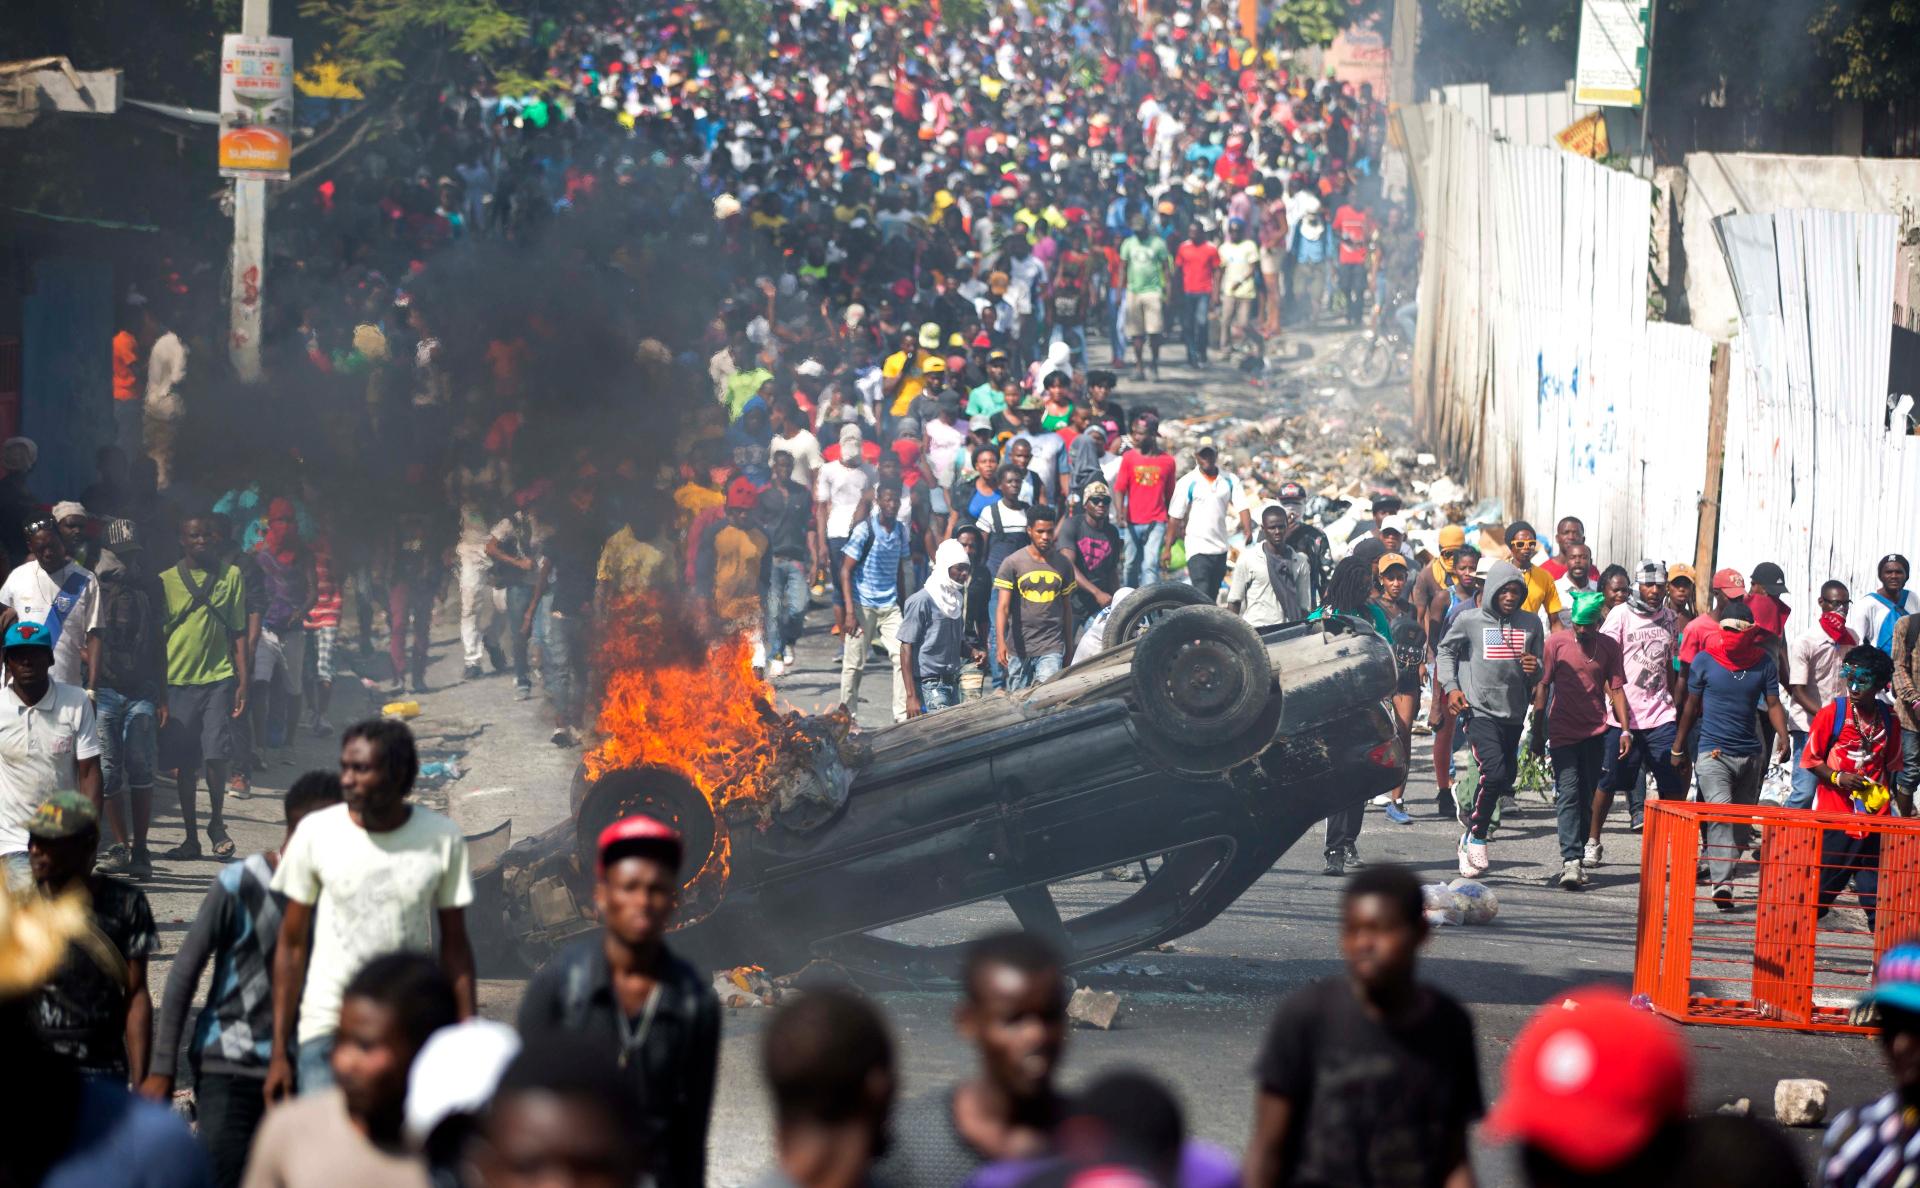 Фото: AP / Dieu Nalio Chery